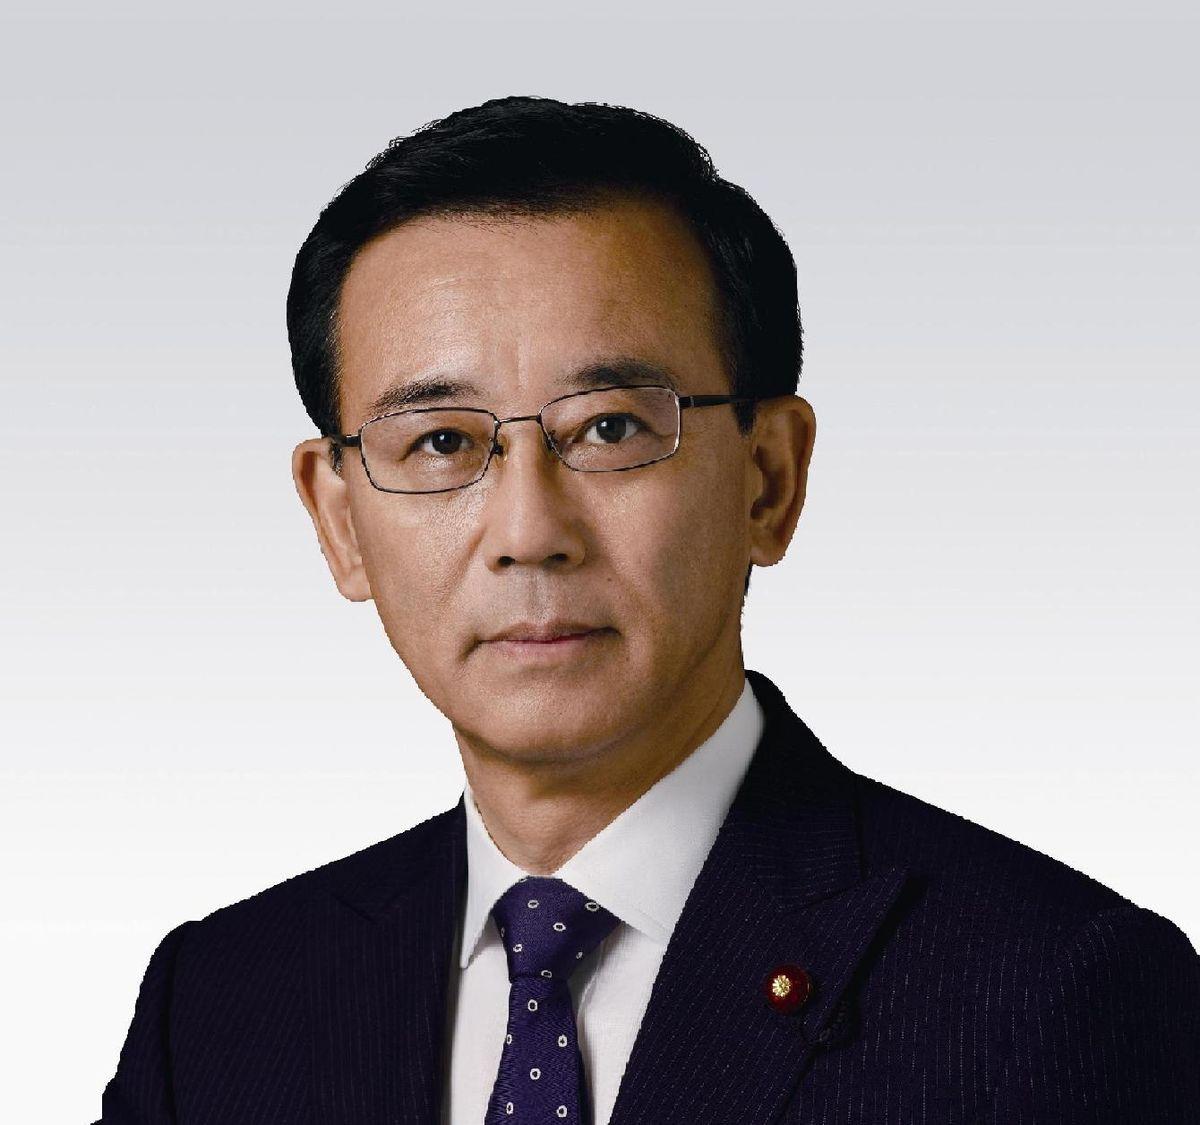 谷垣禎一 - Wikipedia